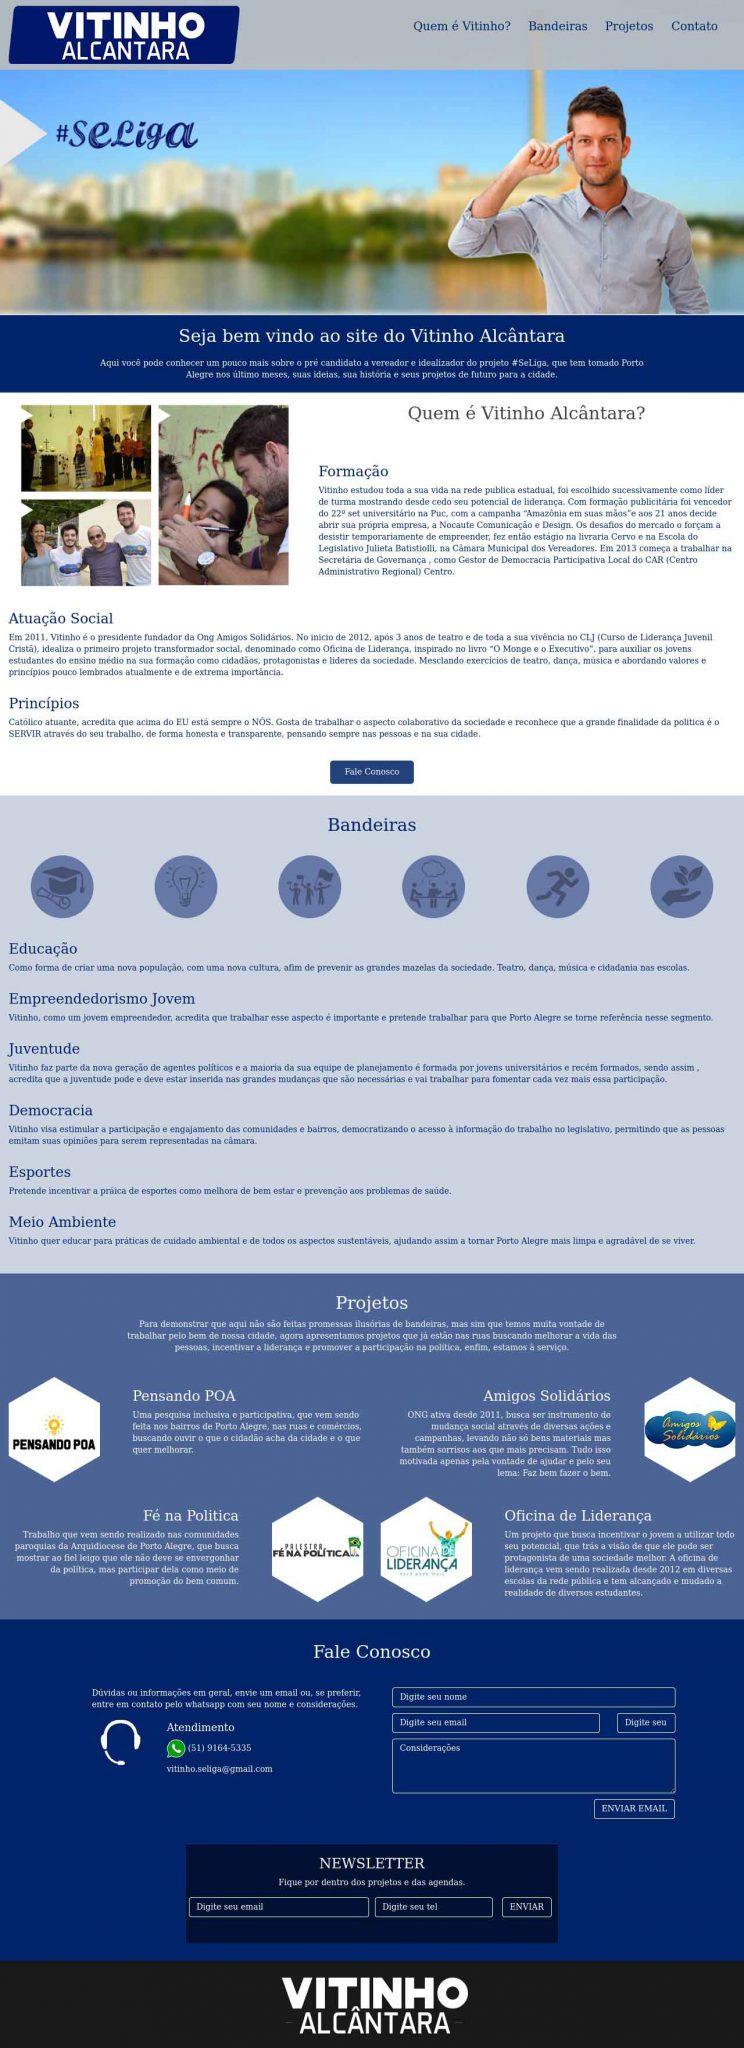 Vitinho-Alcantara-Website